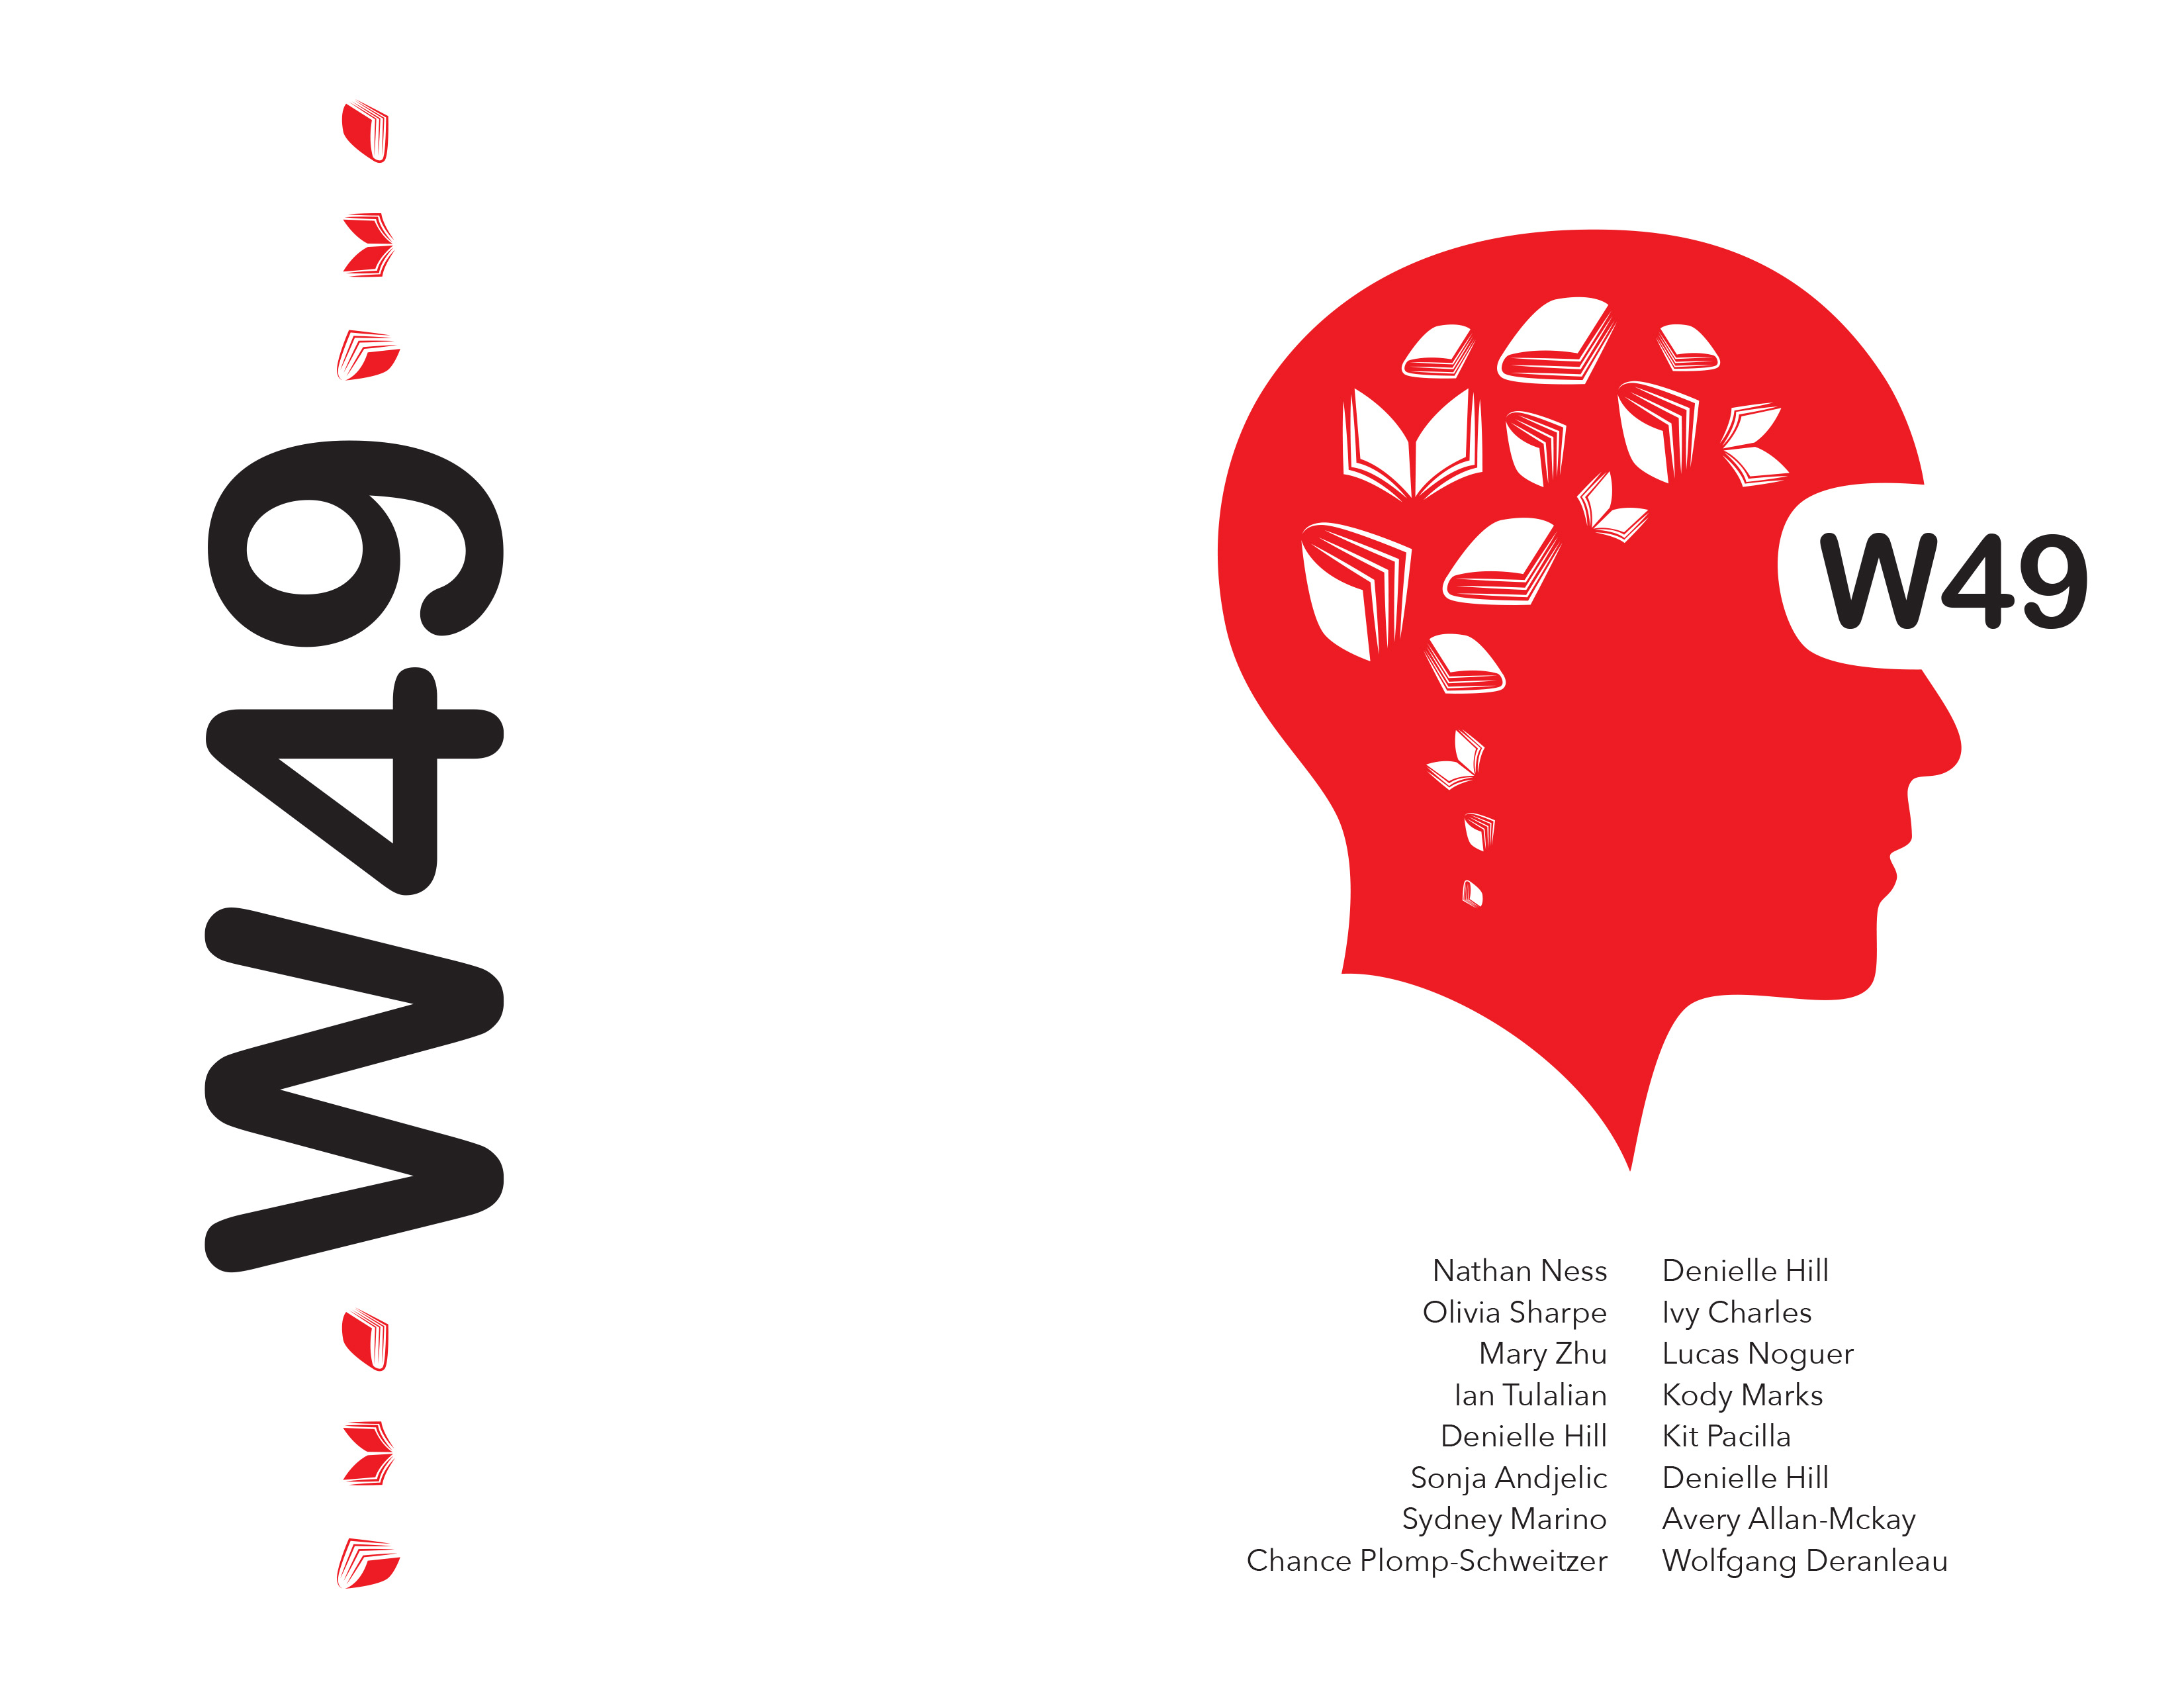 W49-2018-cover